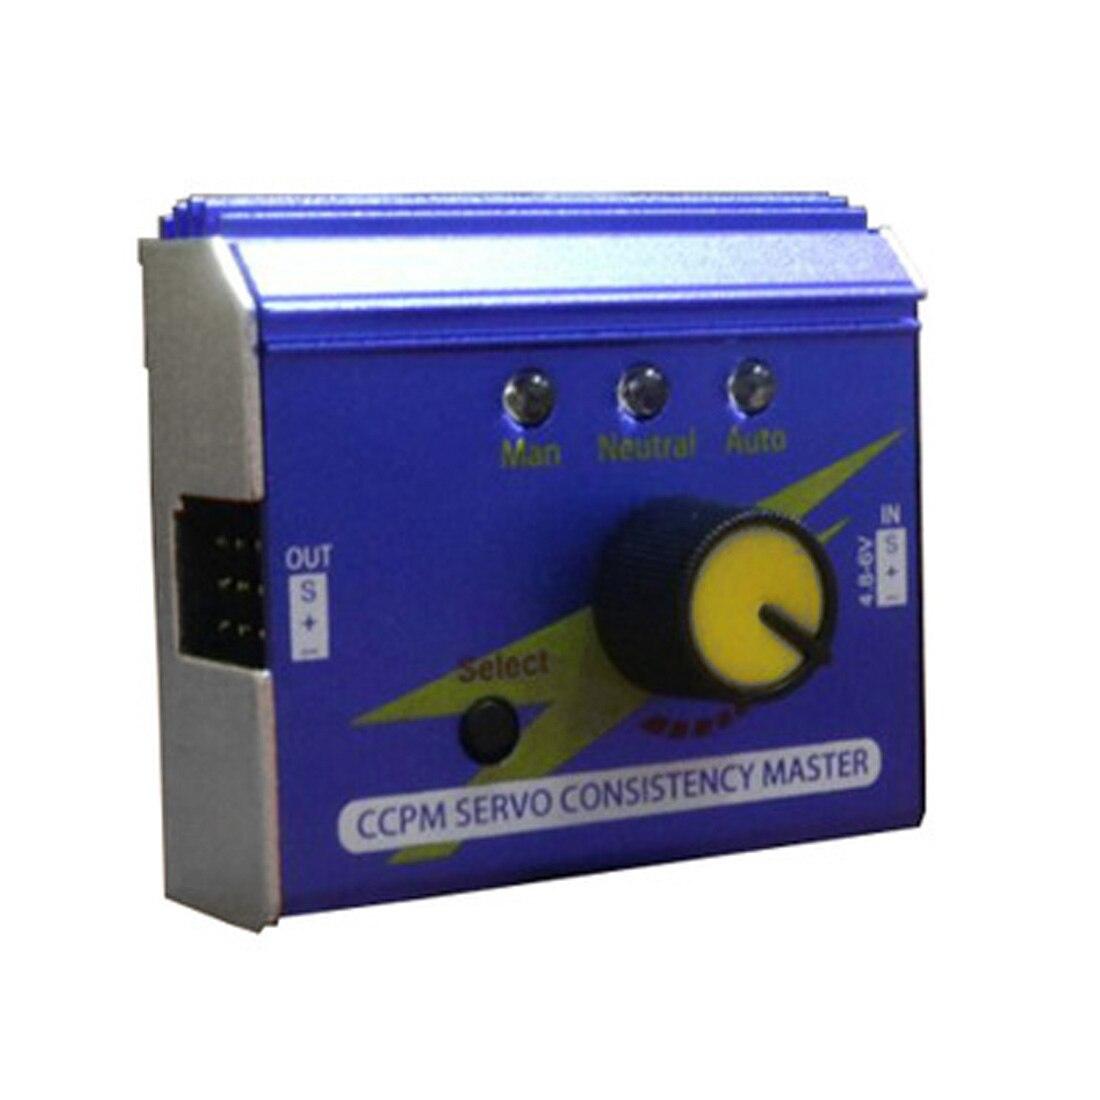 CCPM 3 canales Digital/analógico Multi ESC Servo probador R/C avión coche barco